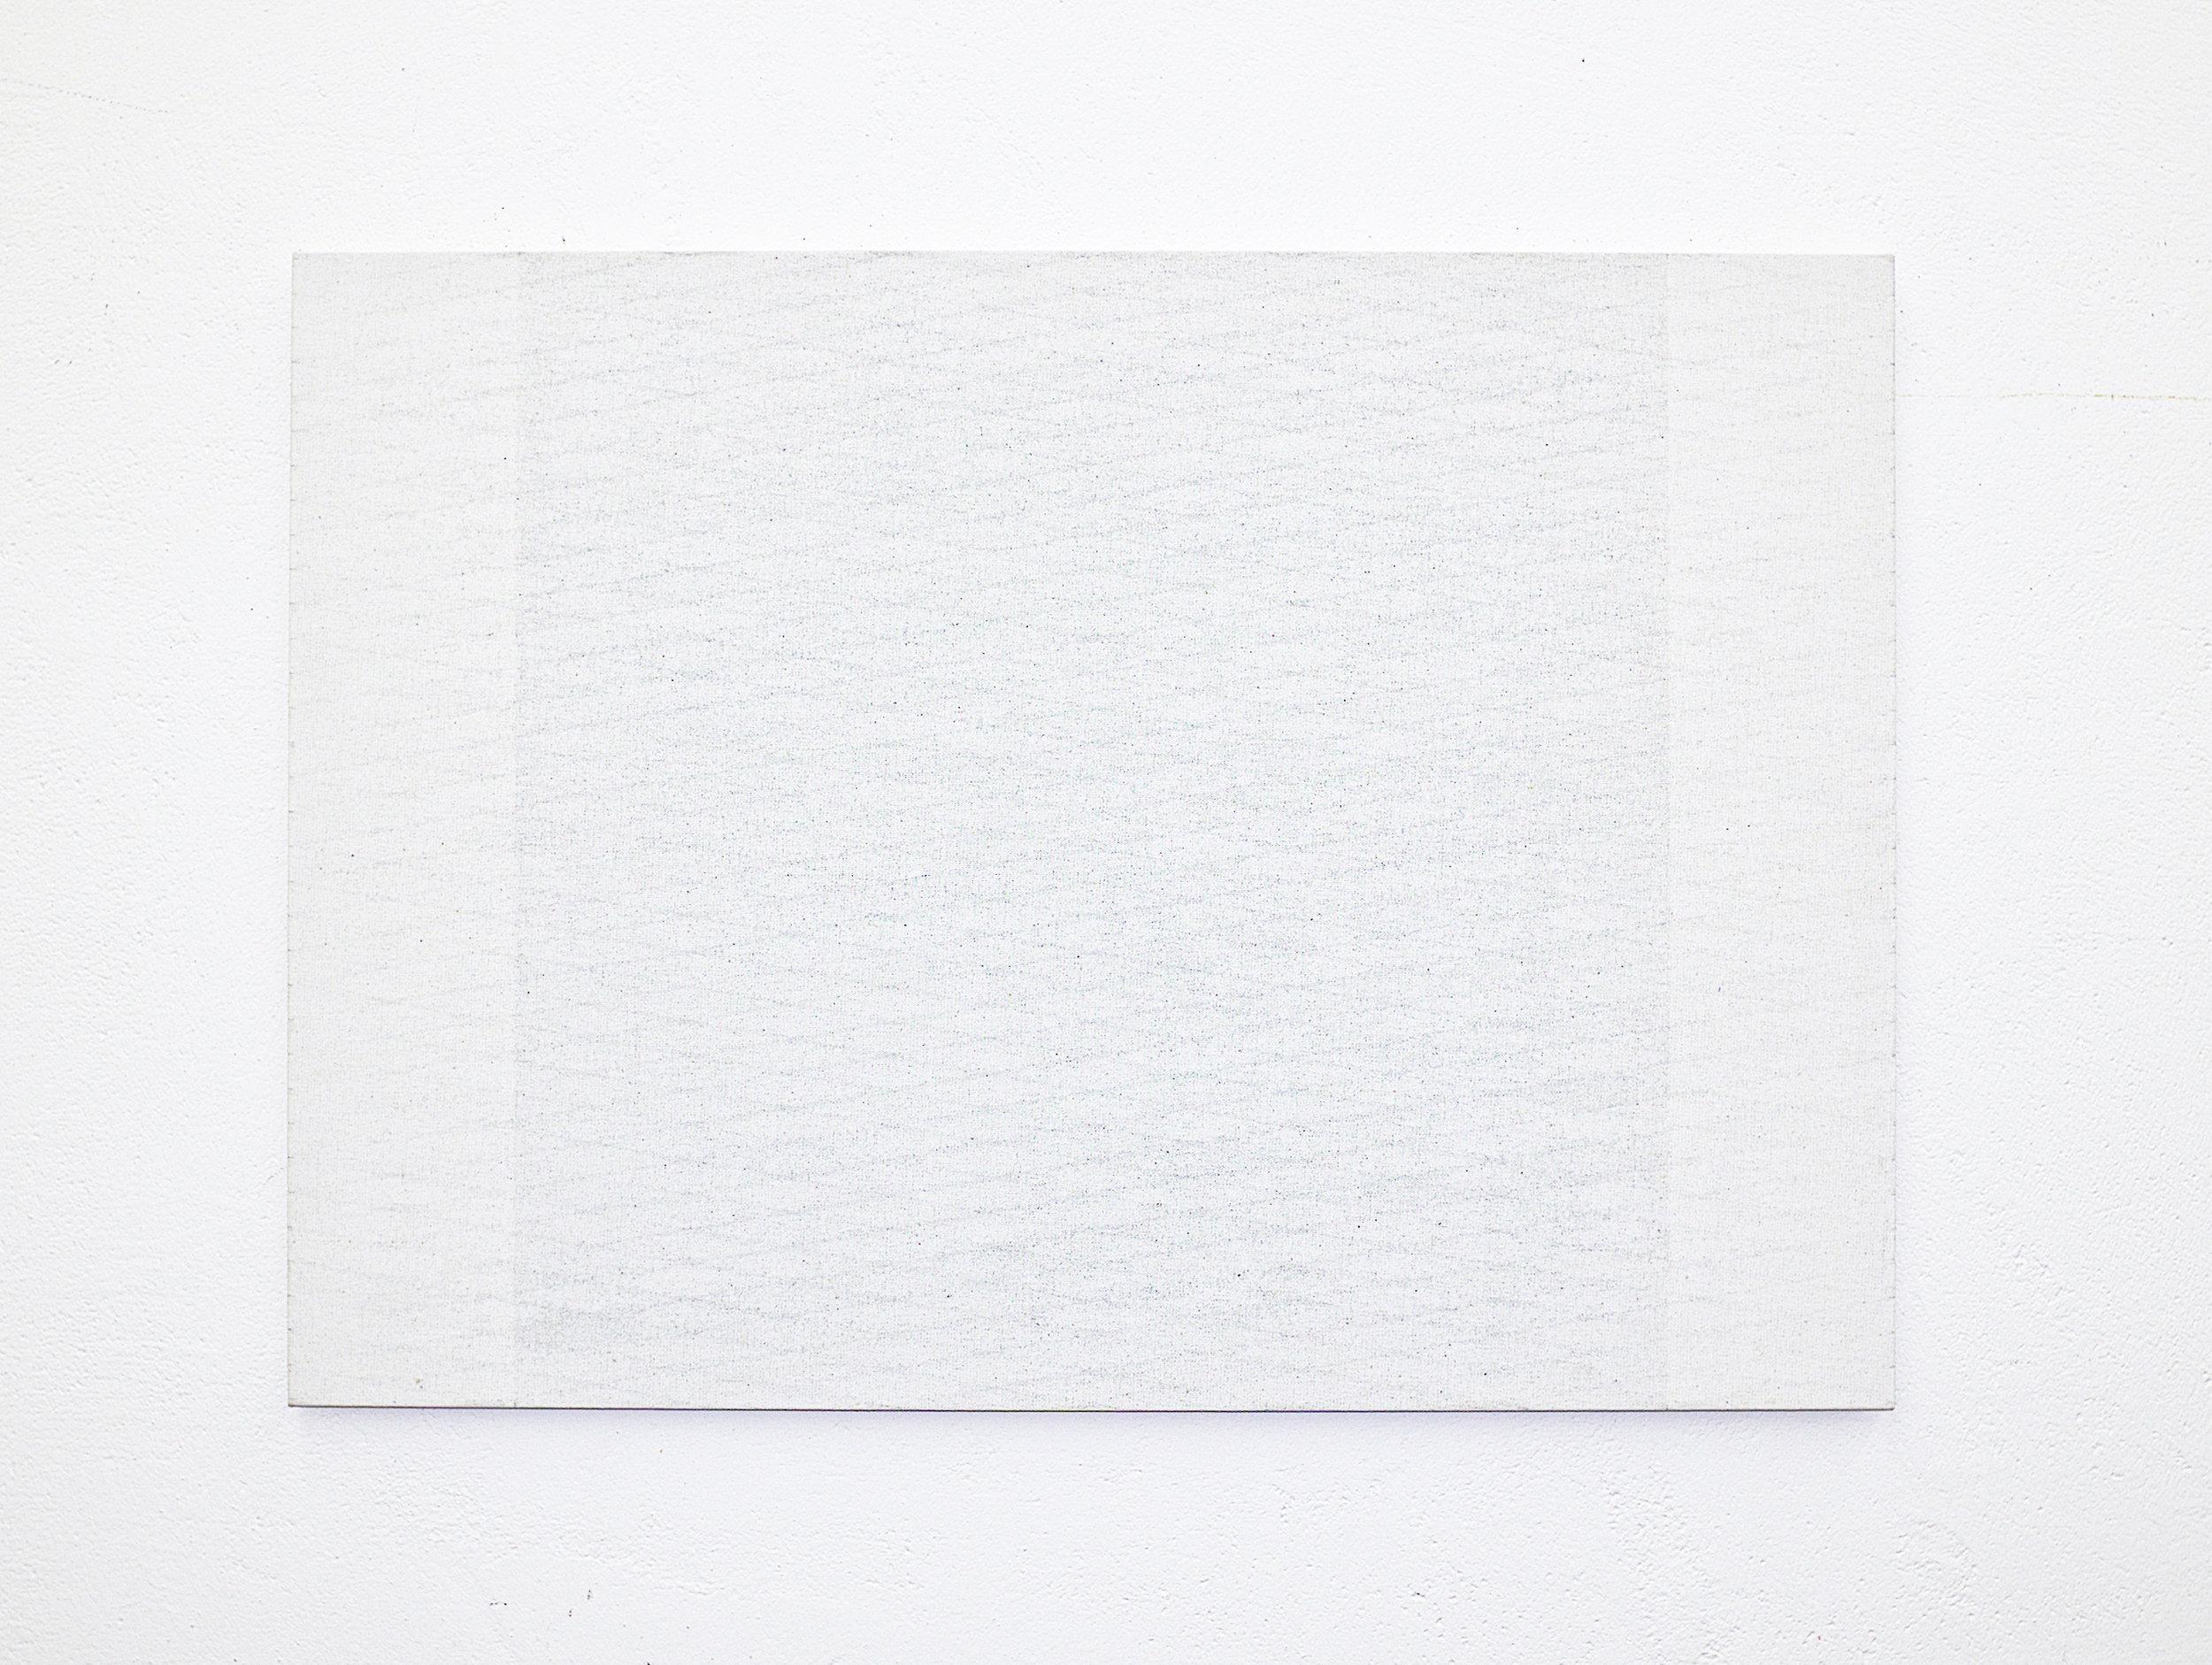 bild nr. 02/2015 - 50 x 70cm - acryl auf baumwolle/alu